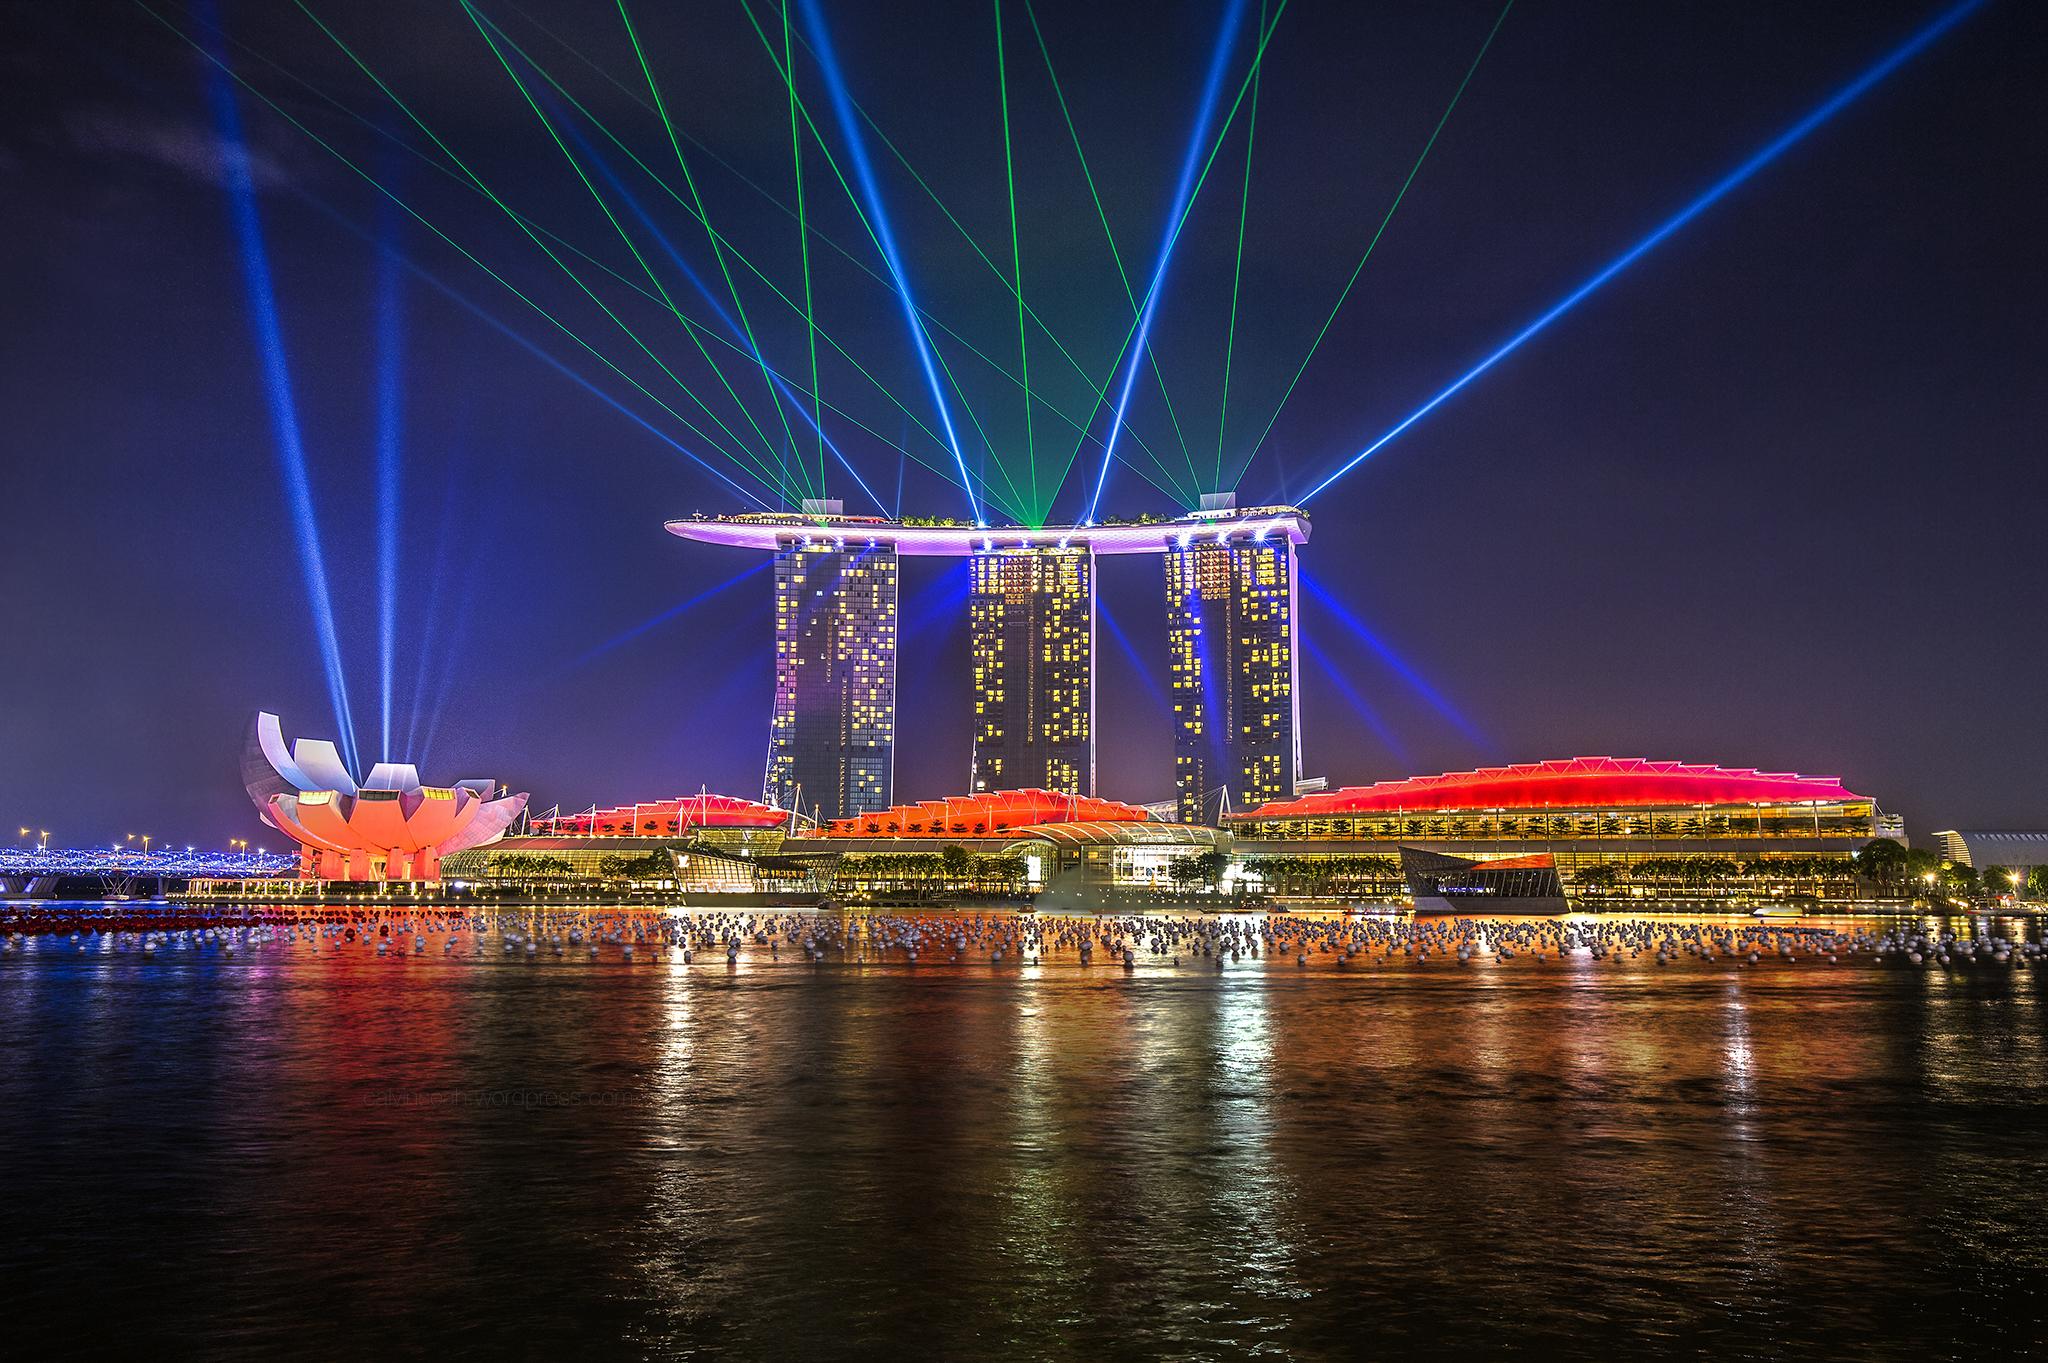 Spectacular dancing lights